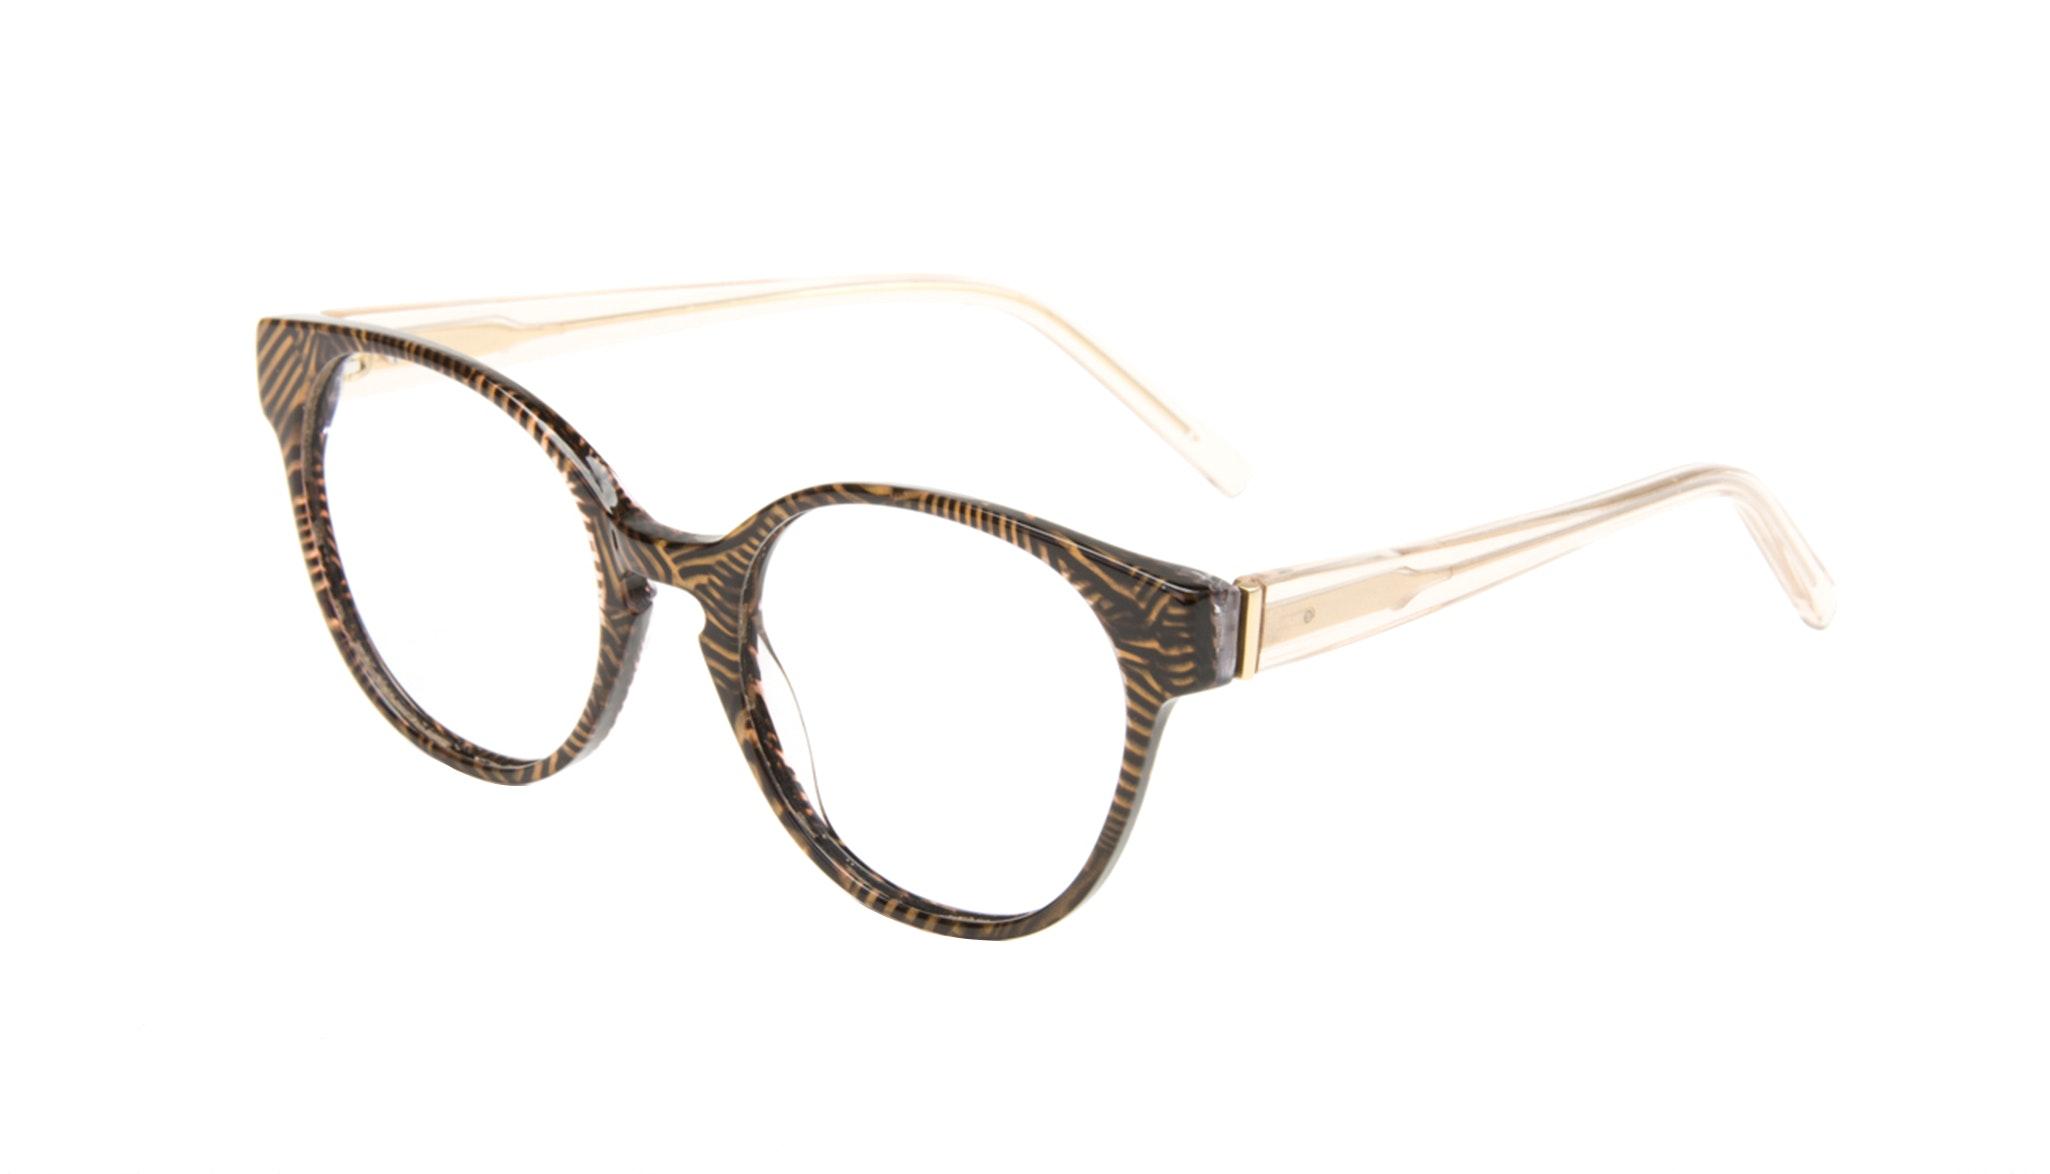 Affordable Fashion Glasses Round Eyeglasses Women Winsome Copper Tort Tilt